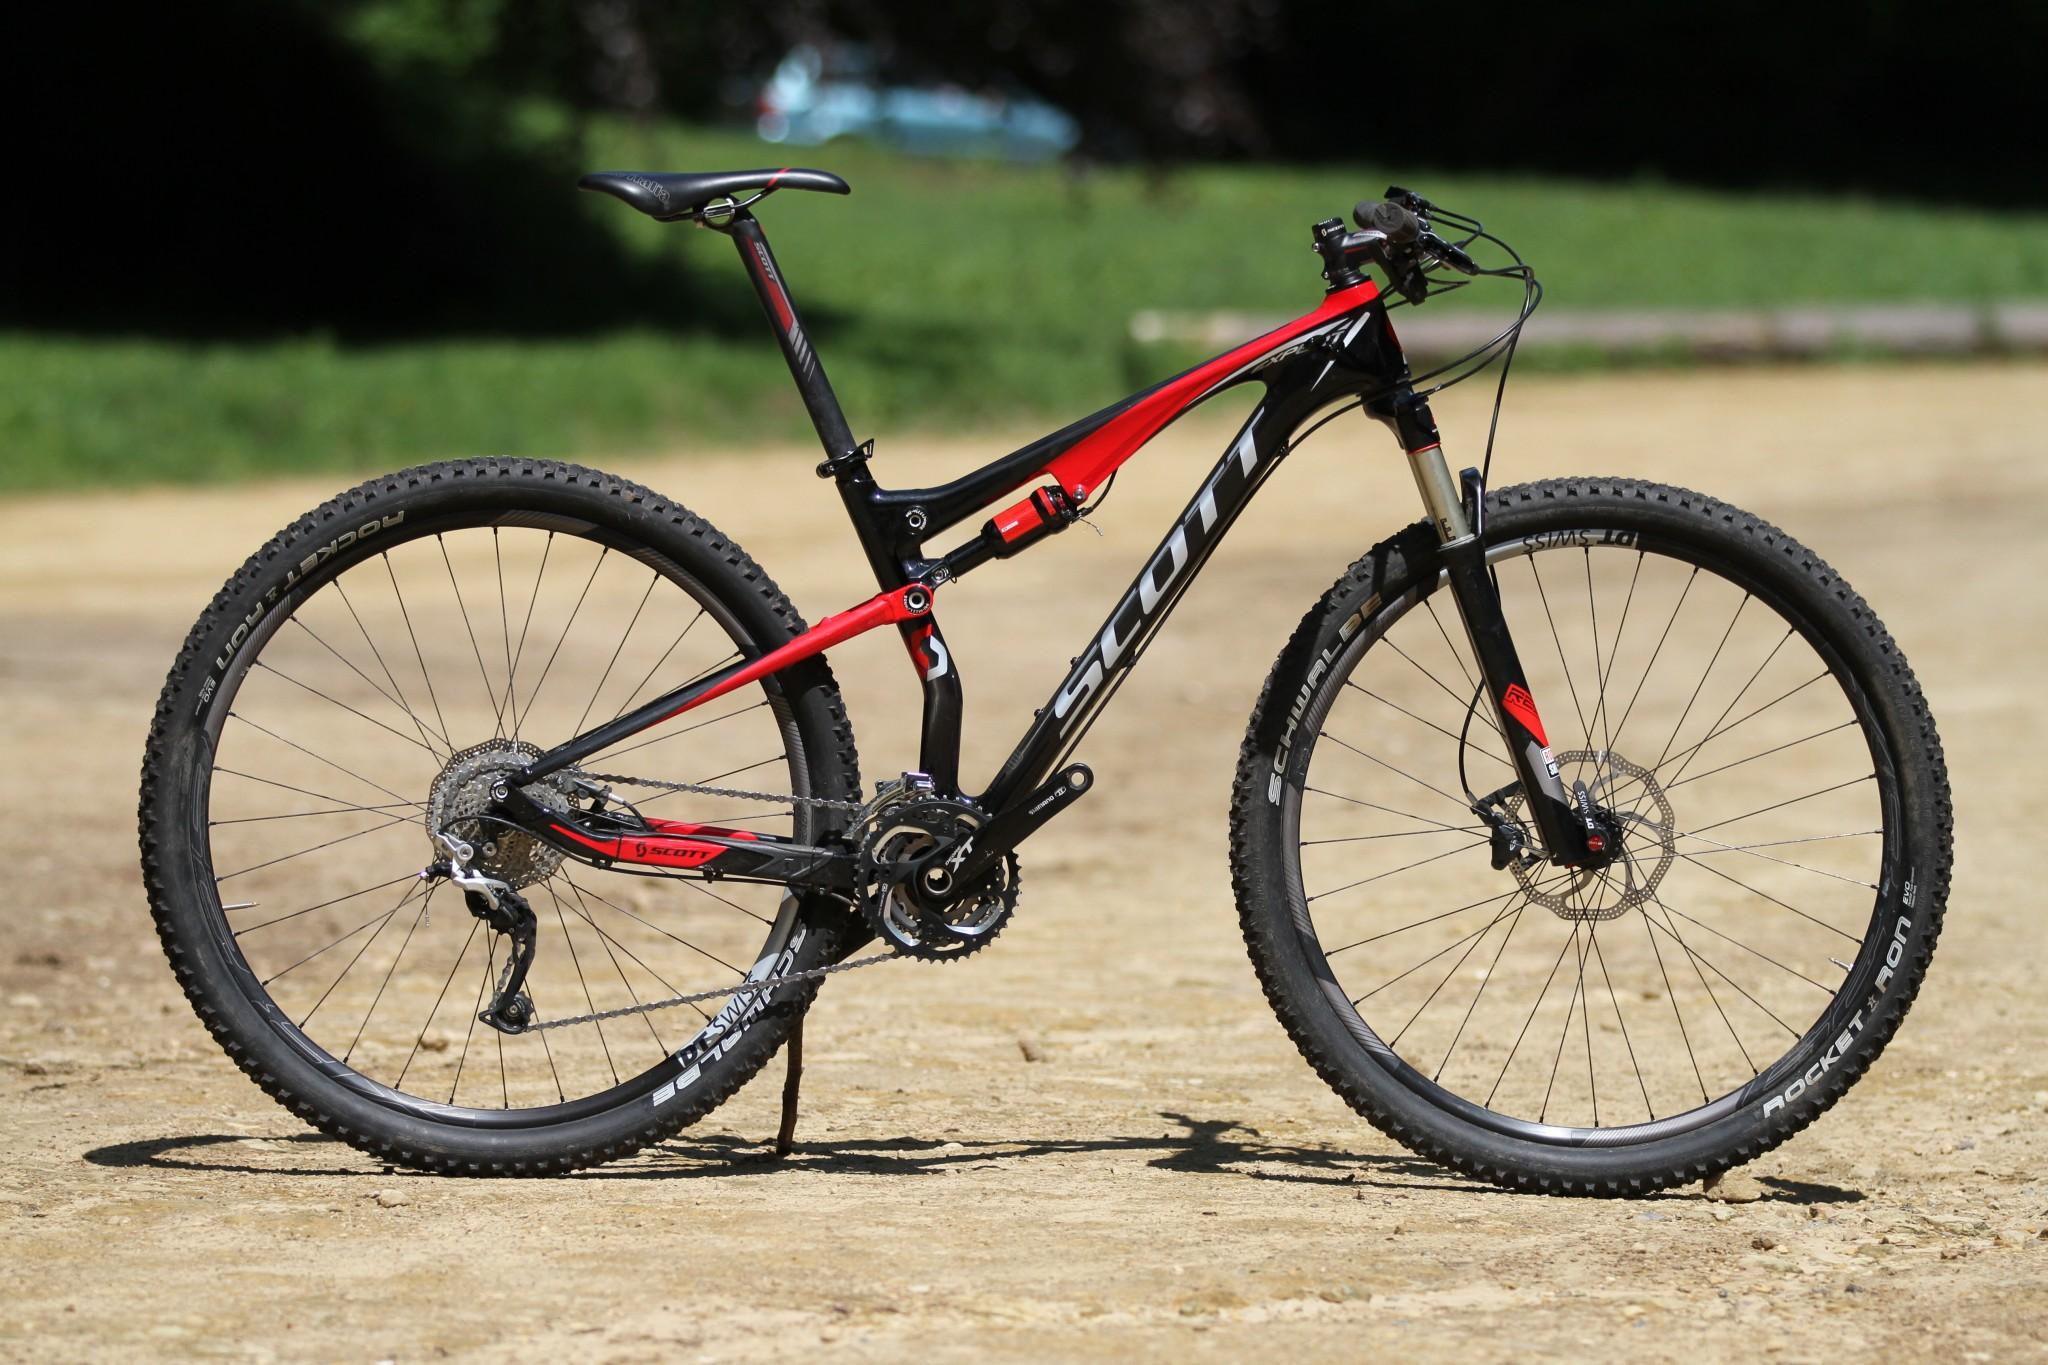 e3f78c75767 Scott Bicycles Spark 29 Expert 2012 | Mountain Bike Reviews » Bikes » XC  Bikes | IMB | Free Mountain Bike Magazine Online